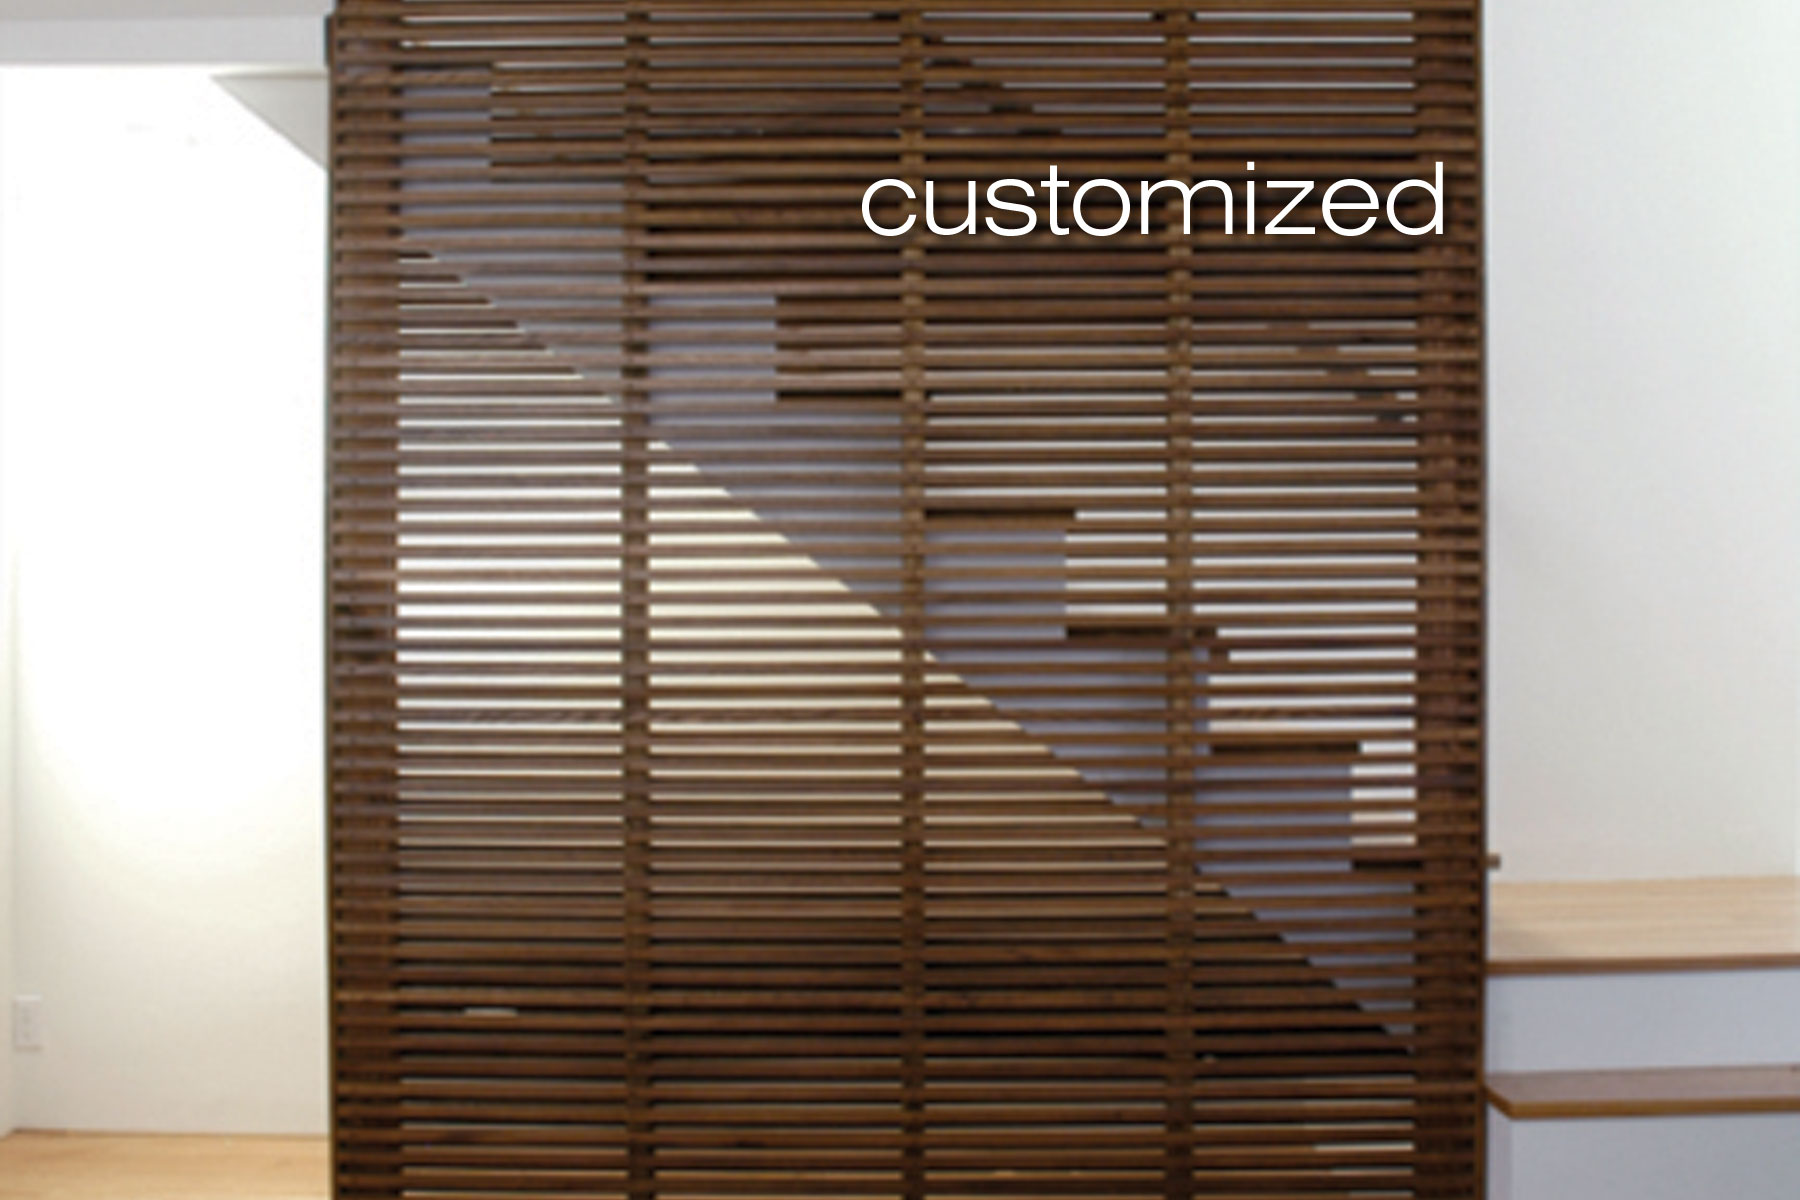 Wall-Customized.jpg